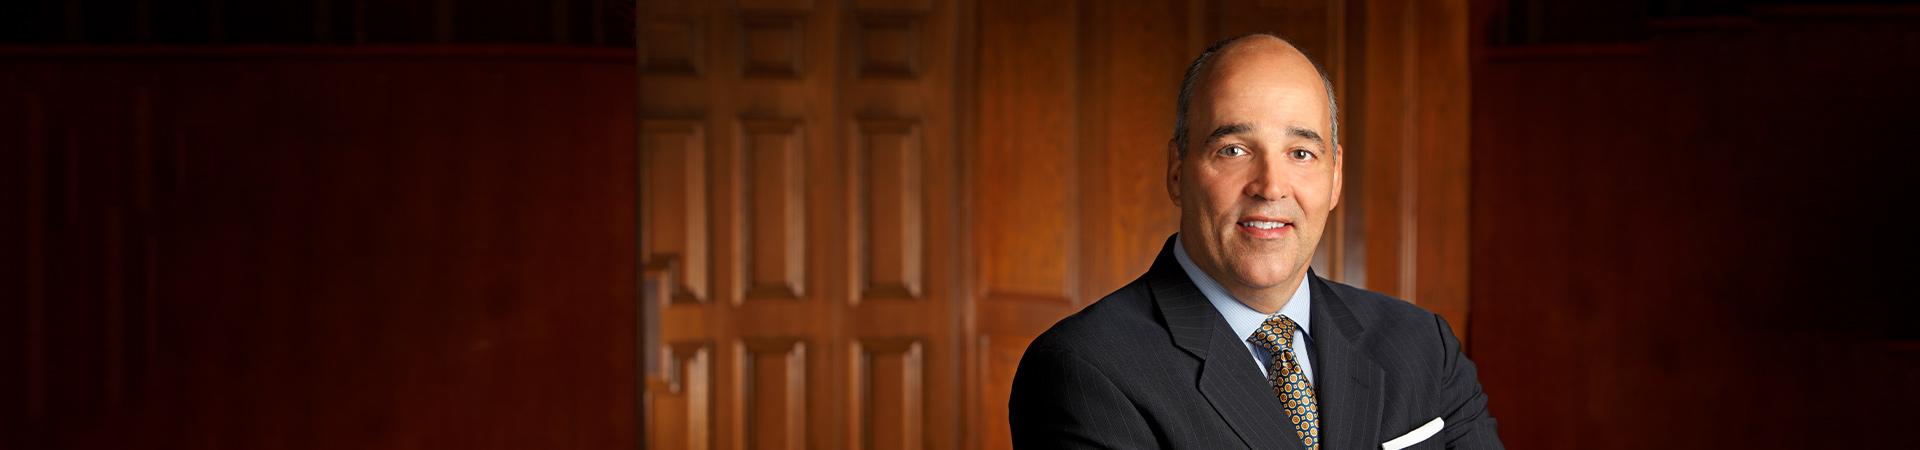 Dr. Michael R. Cunningham, Chancellor, National University System